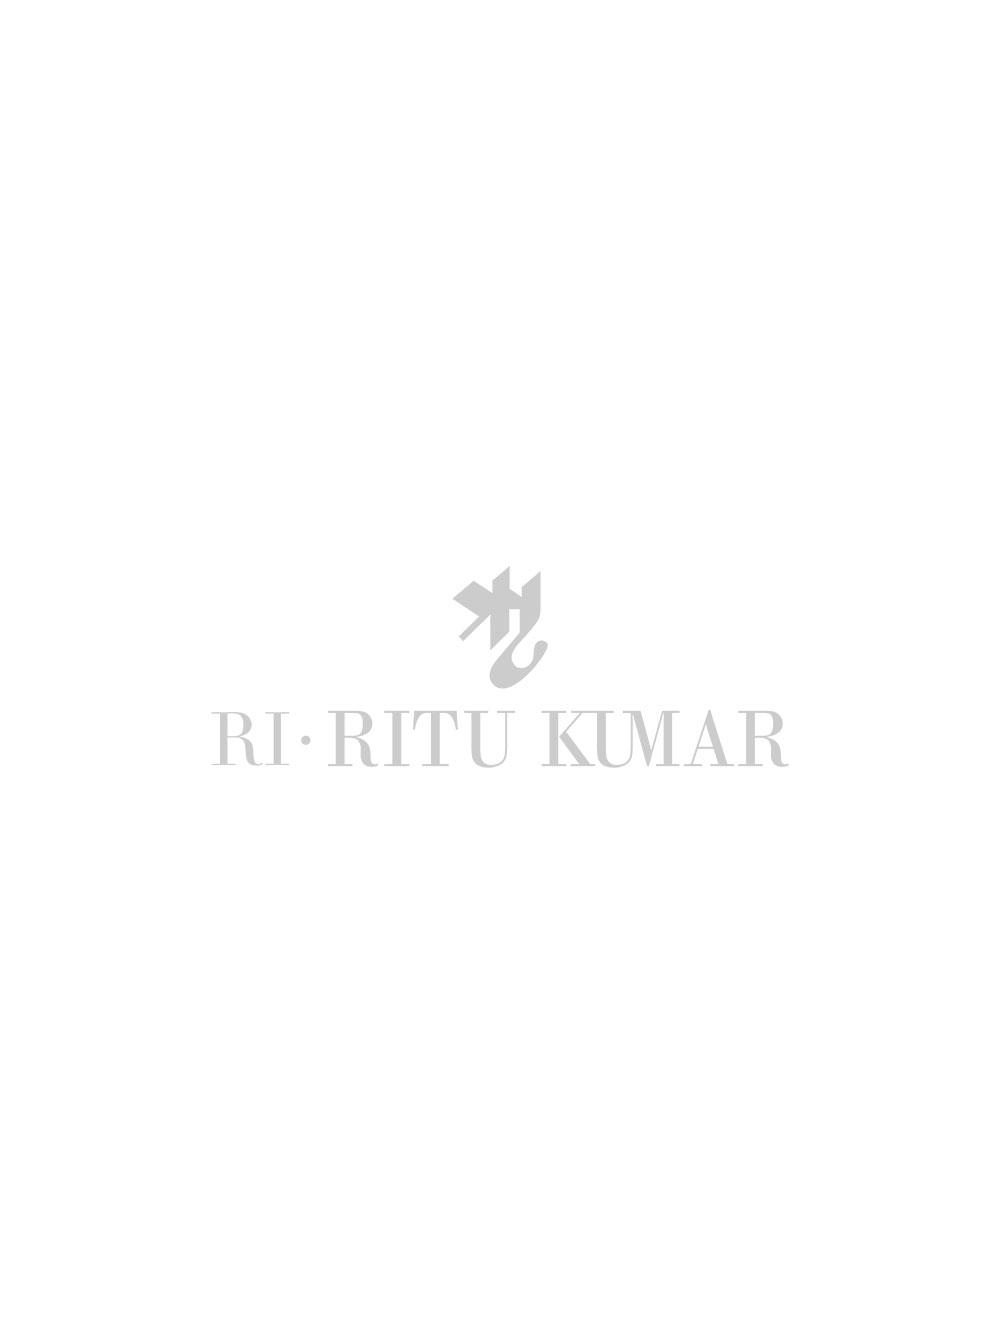 Off White & Grey Embroidered Kurta With Dupatta And Churidar